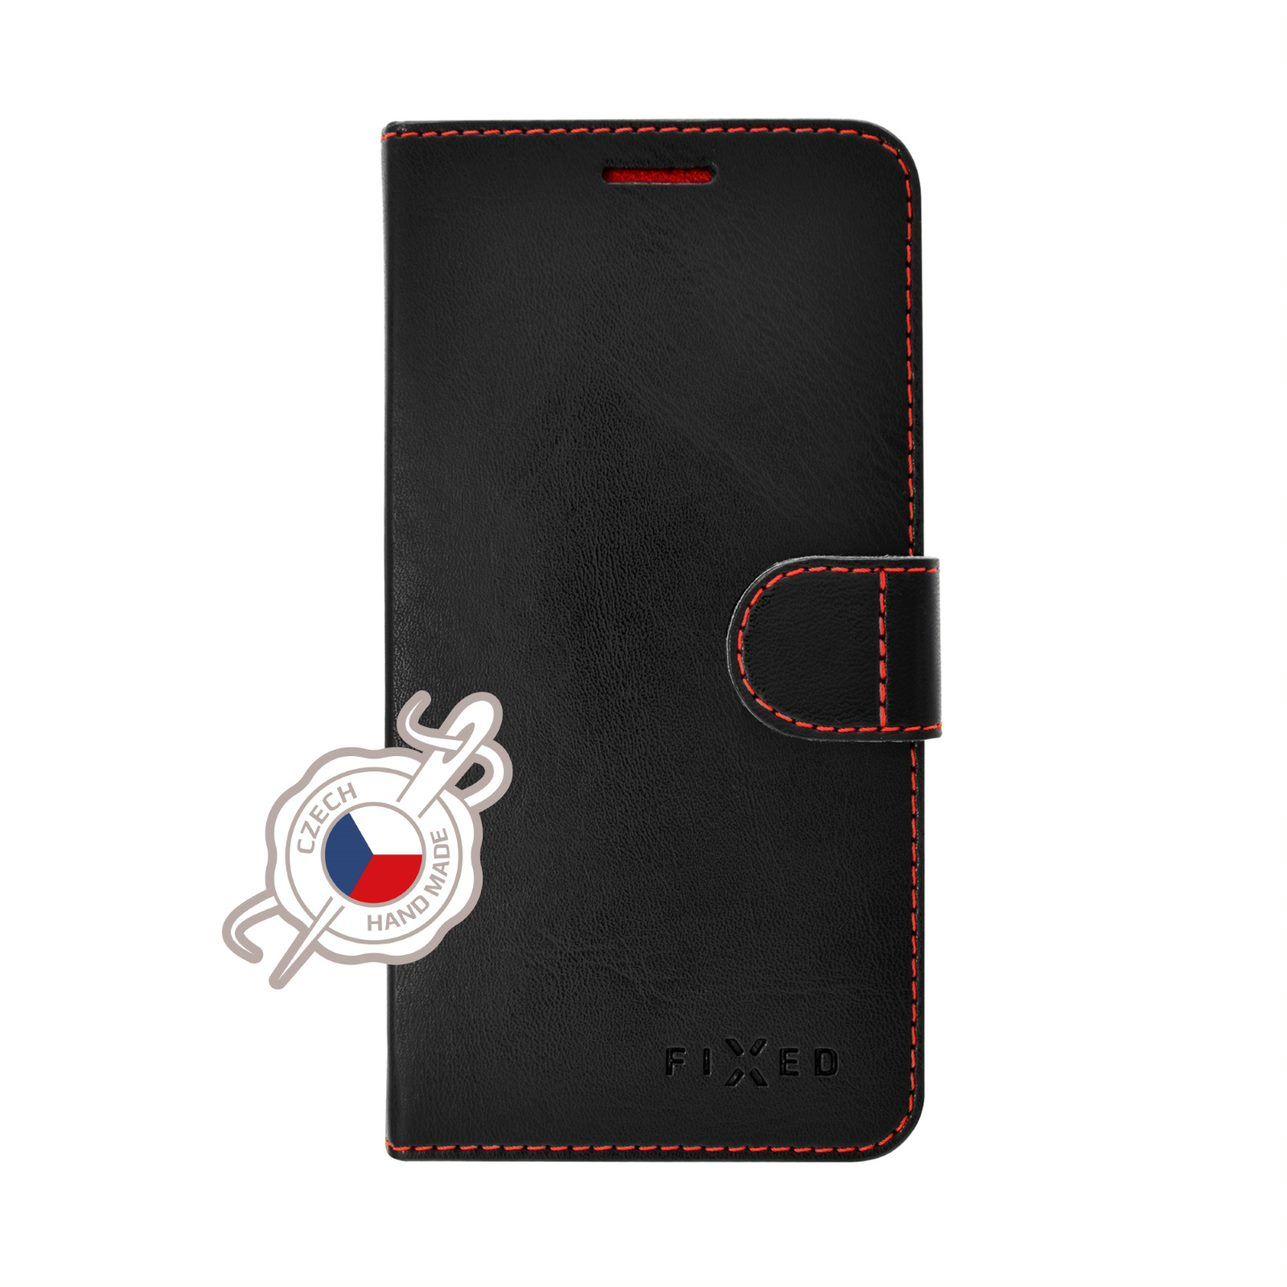 Pouzdro typu kniha FIXED FIT pro Samsung Galaxy J3 (2017), černé